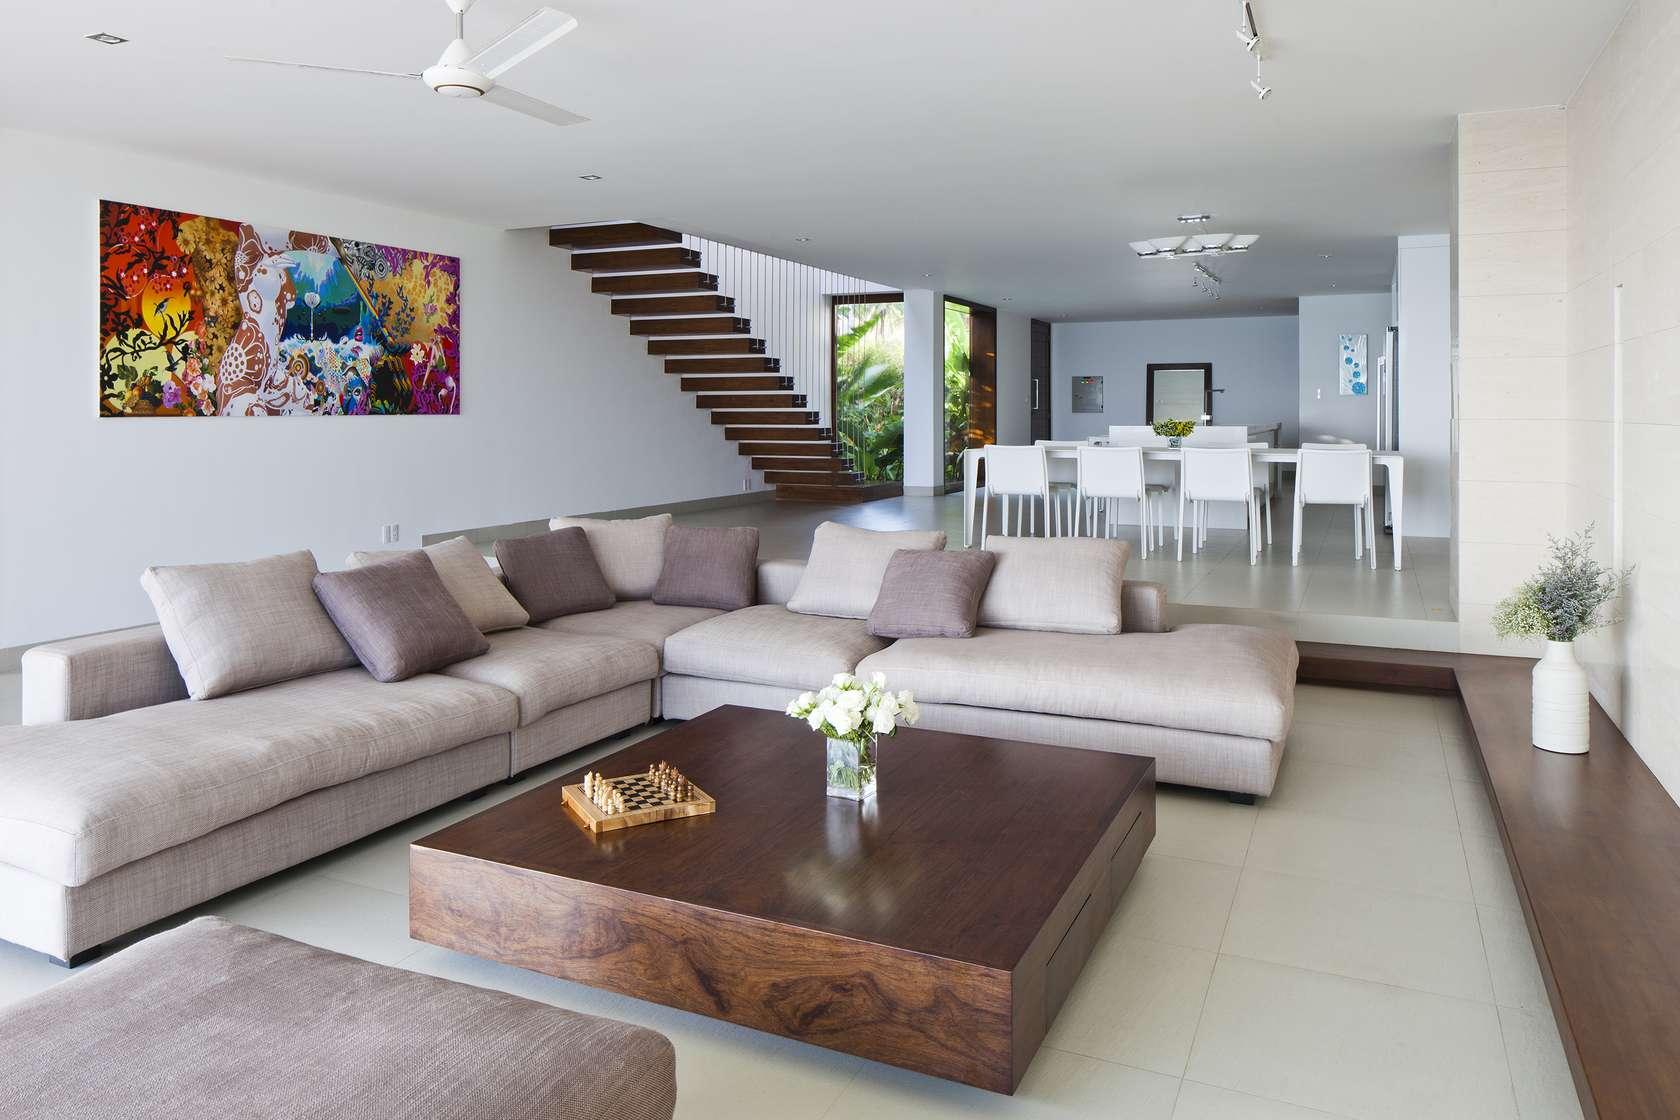 Narrow Deck Furniture Layout